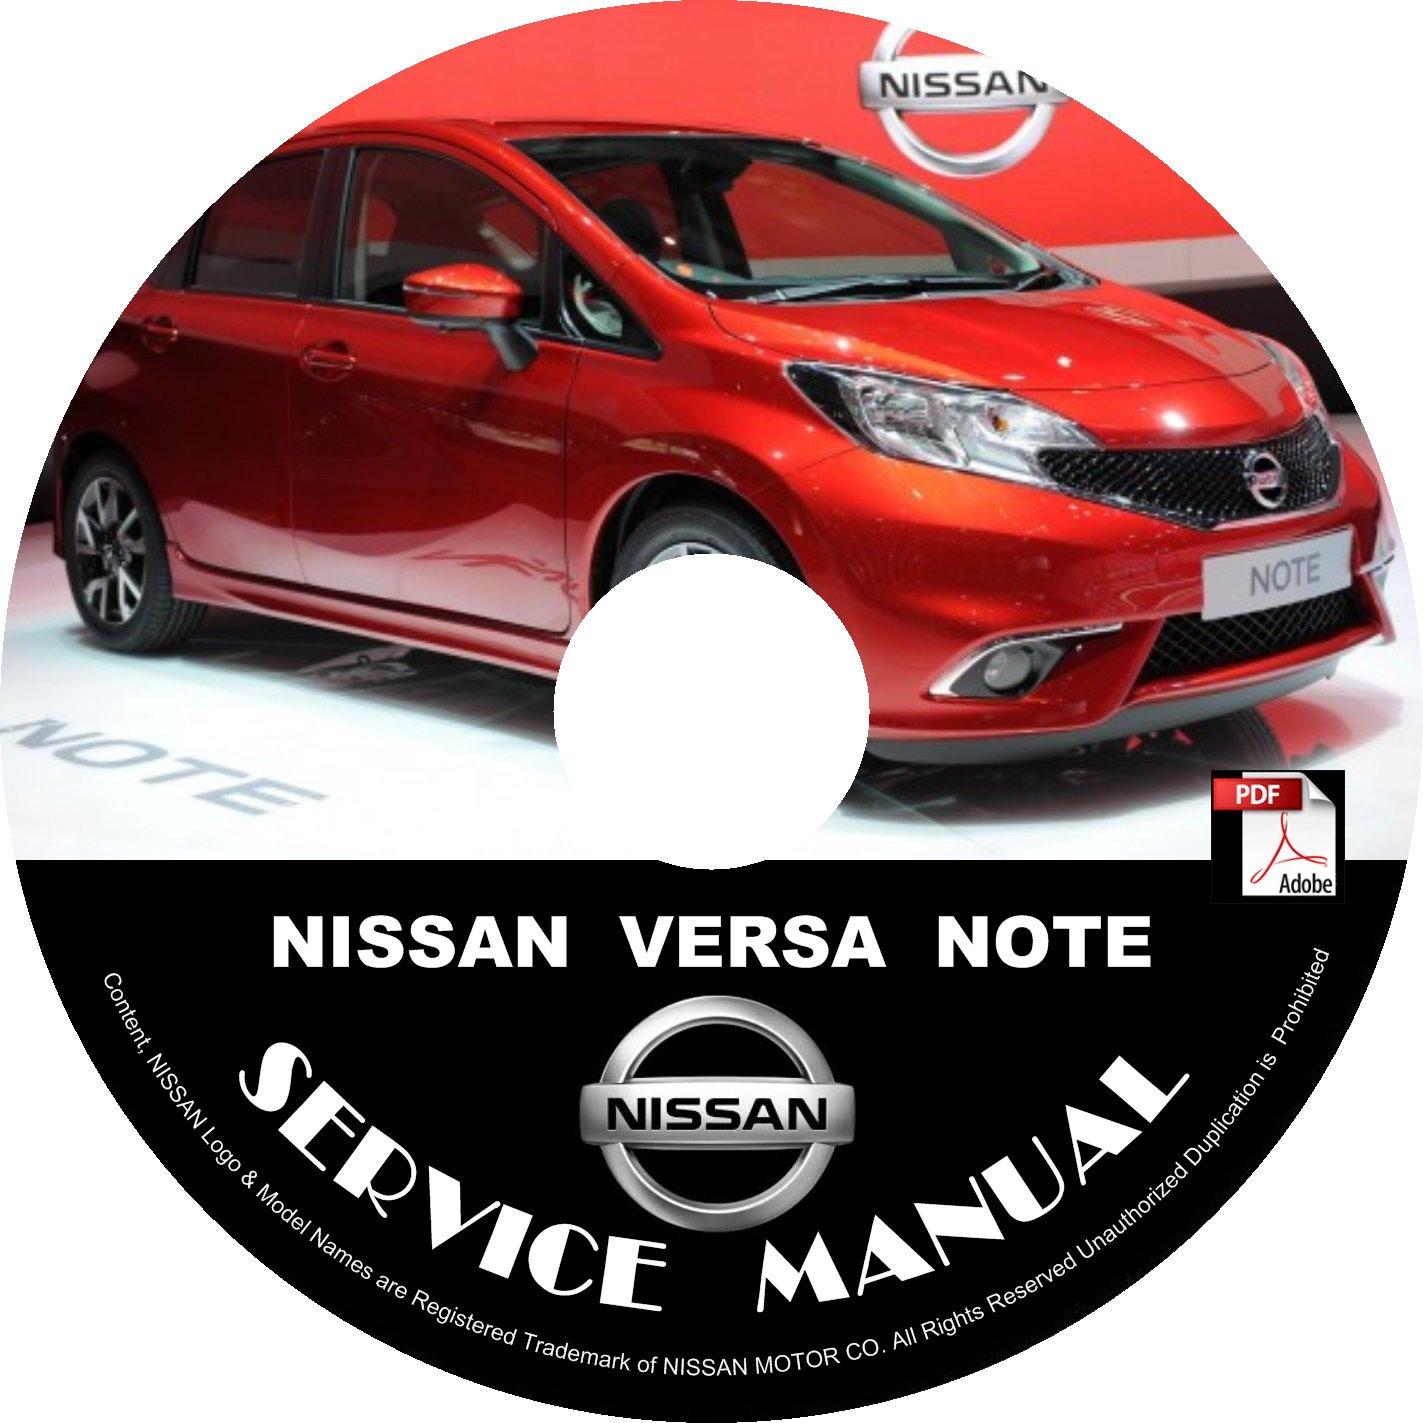 2016 Nissan Versa Note Service Repair Shop Manual on CD